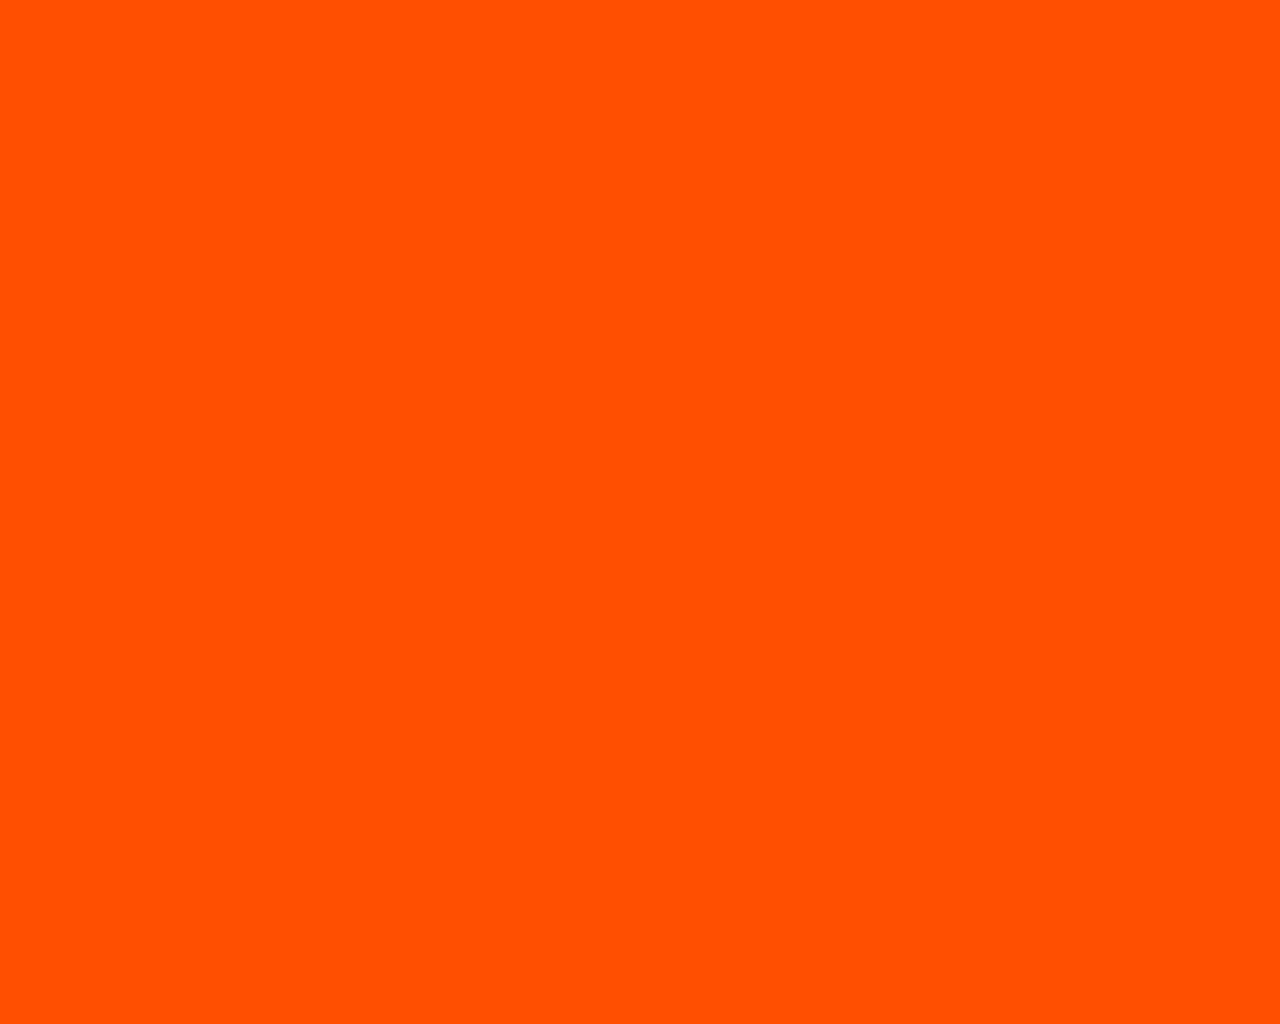 1280x1024 International Orange Aerospace Solid Color Background